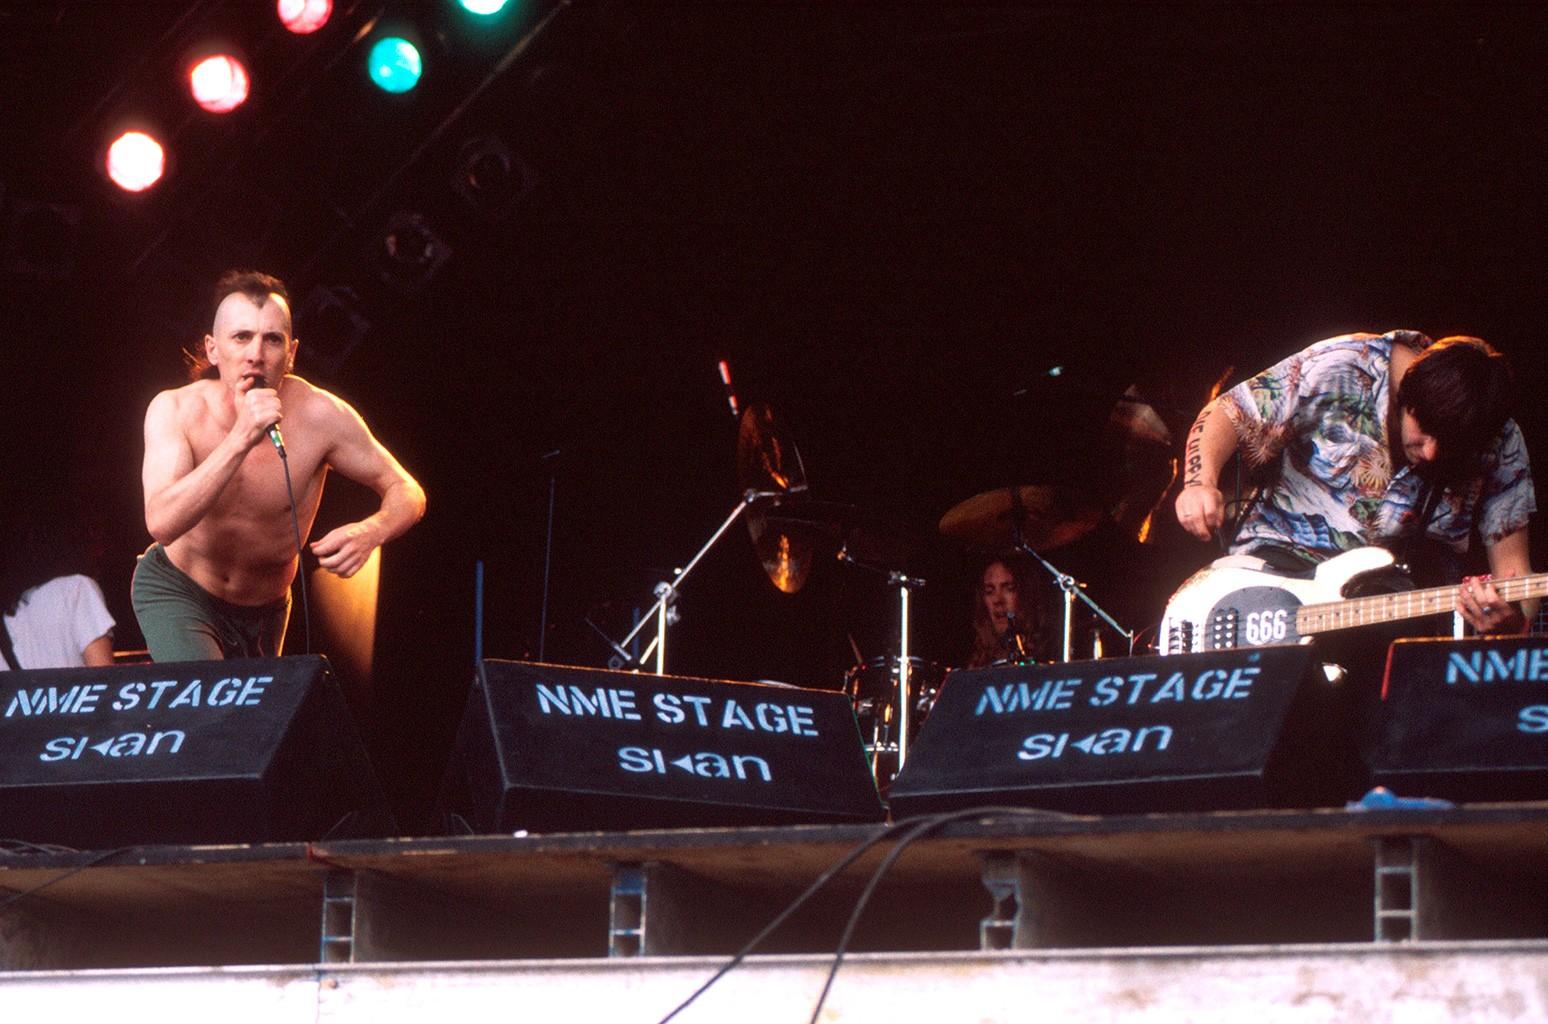 Tool performs on stage at Glastonbury Festival.